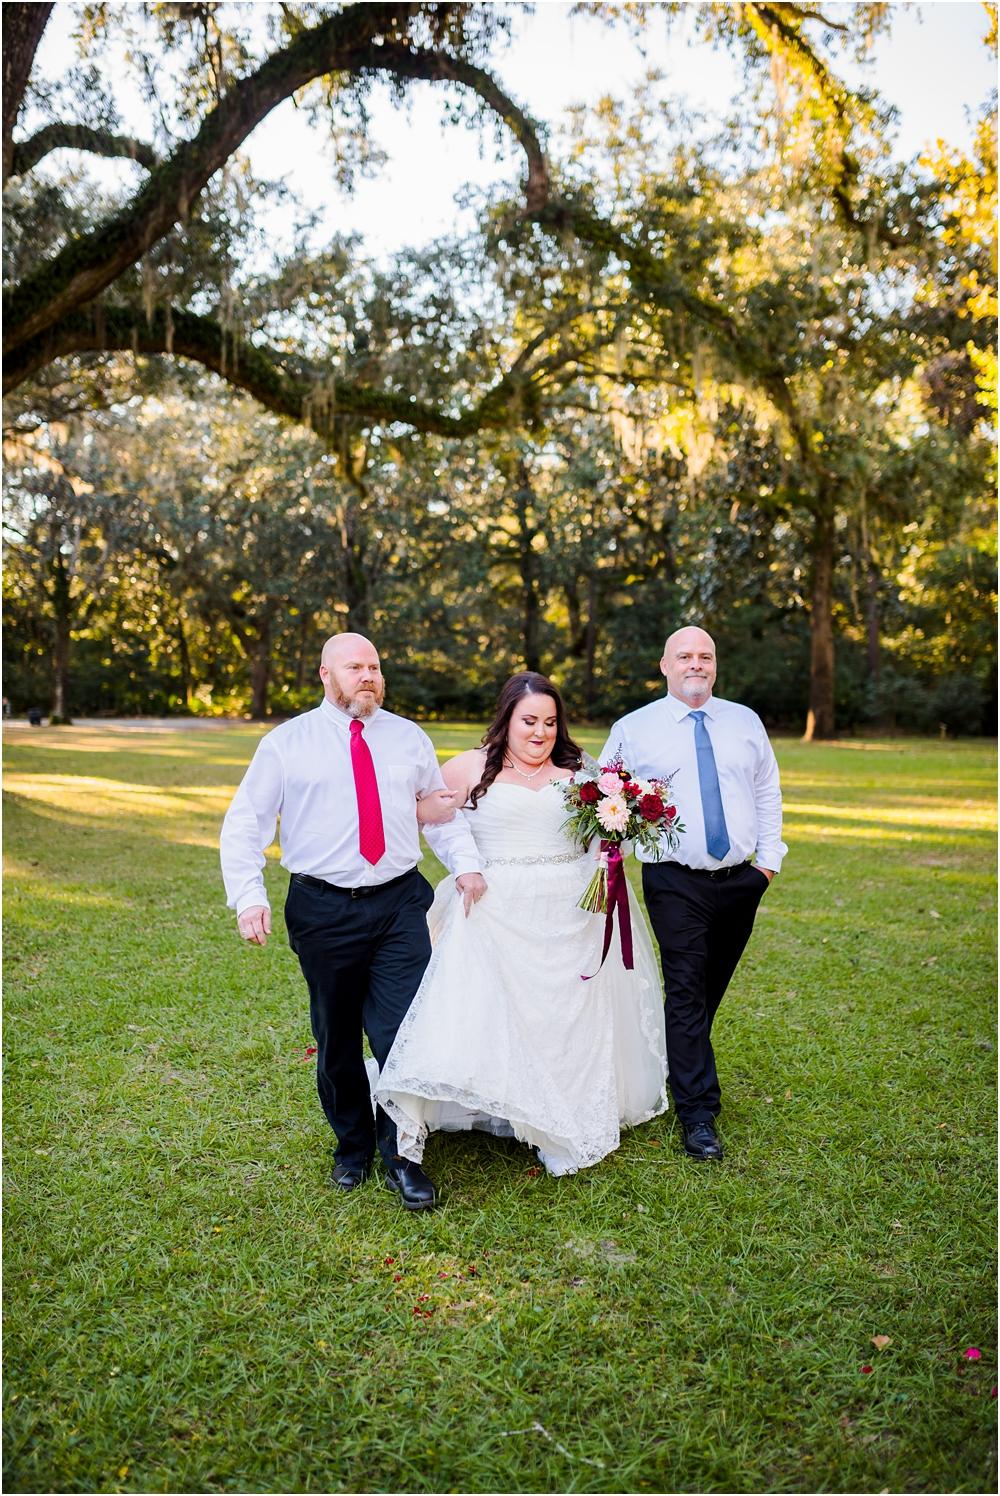 Eden-Gardens-florida-wedding-photographer-kiersten-stevenson-photography-54.jpg